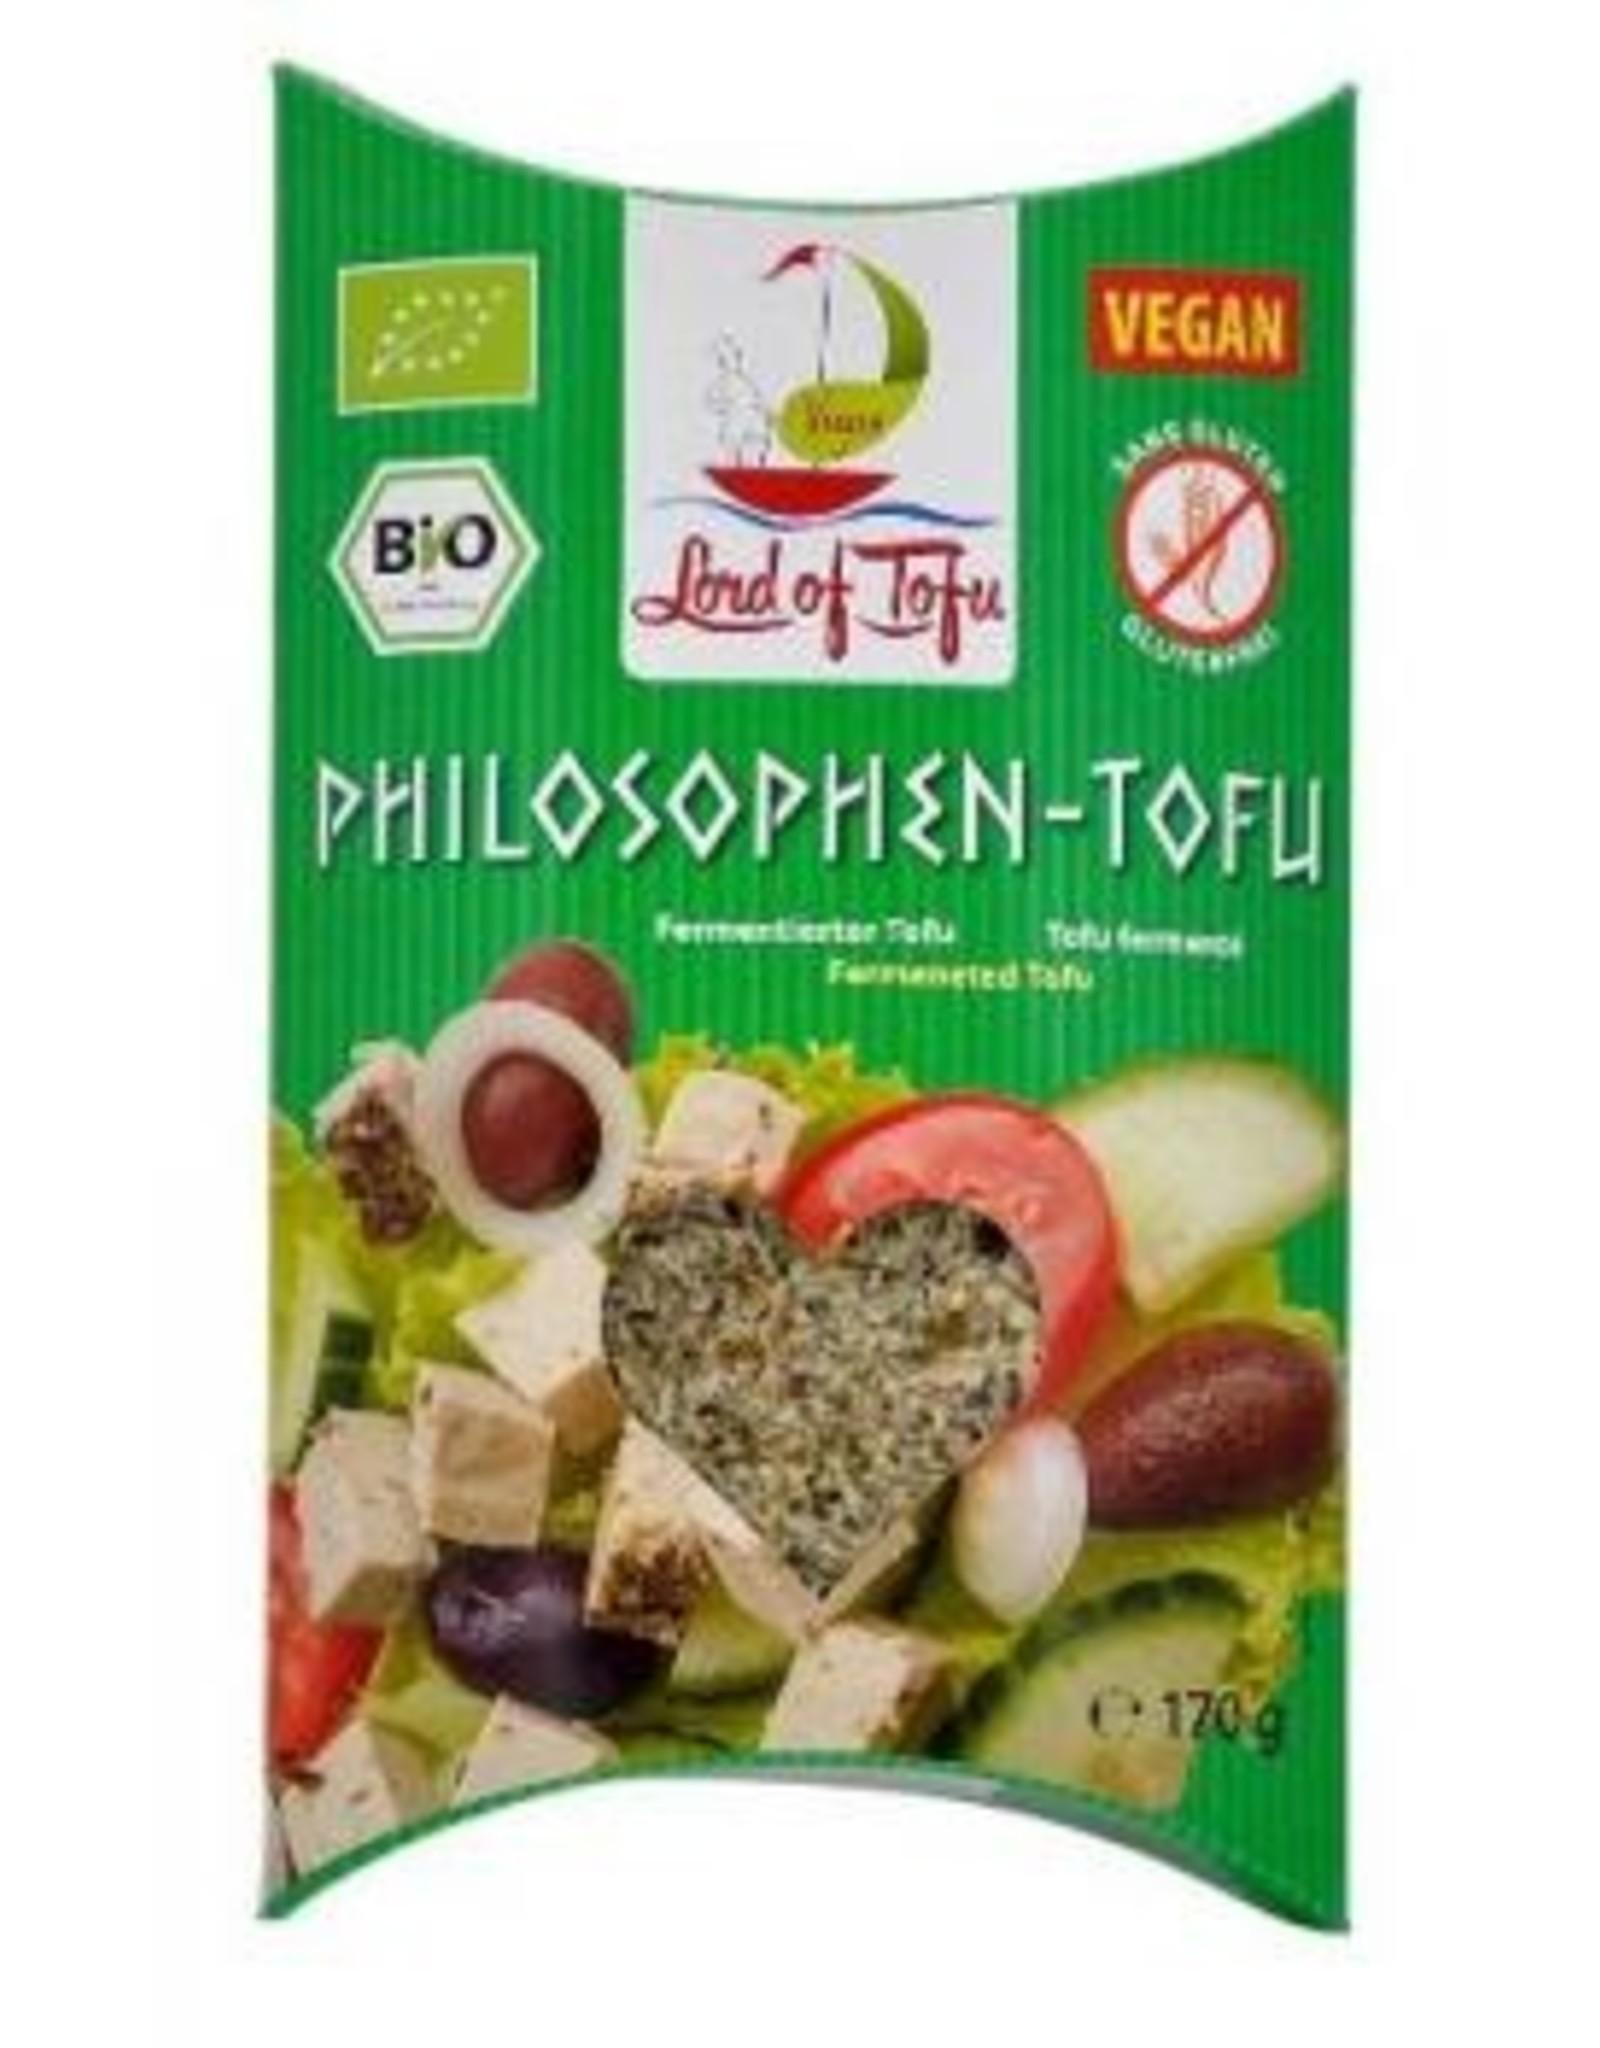 Lord of Tofu Philosophen Tofu, 170g